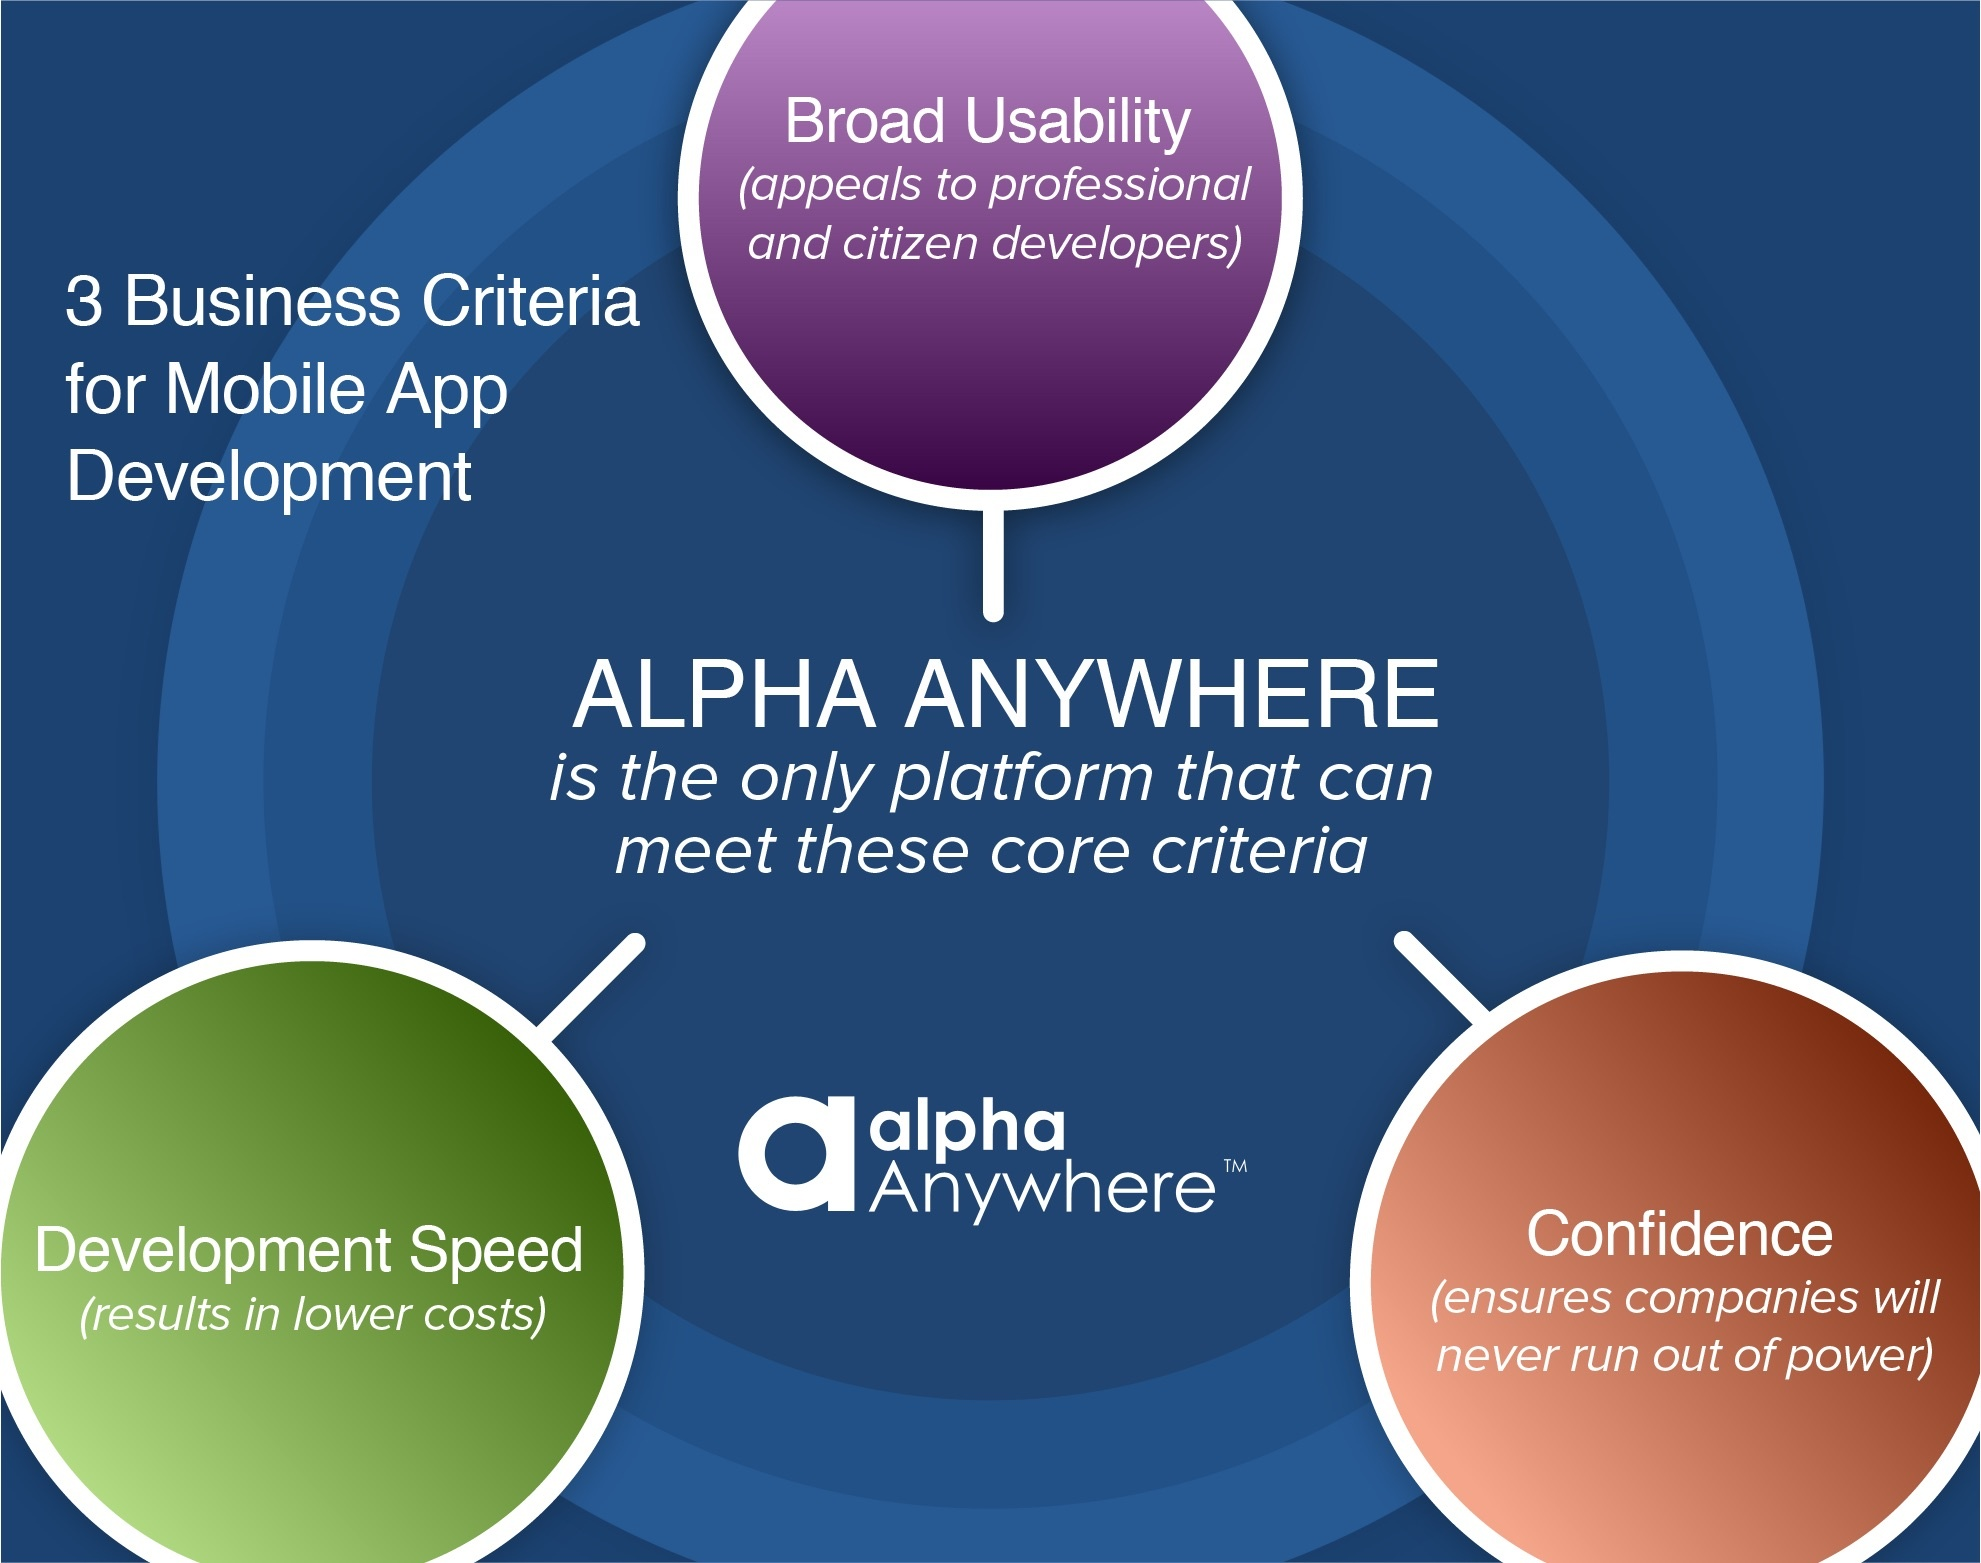 Does Your Low Code Development Platform Meet the 3 Key Business Criteria for Mobile App Development?